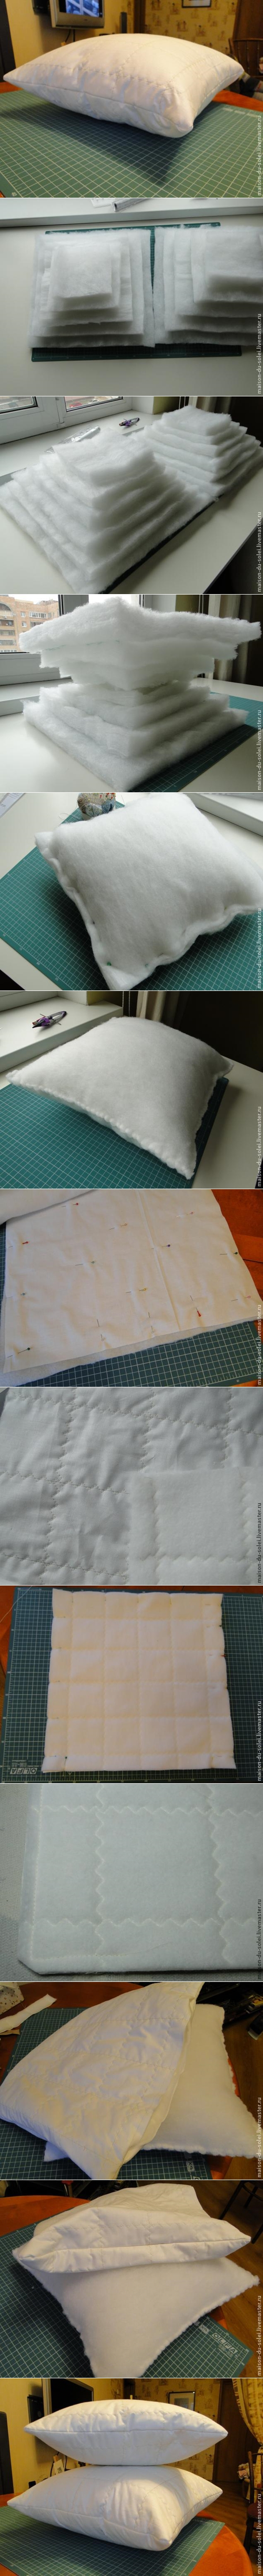 Sew Hack: DIY Plump Cushion Insert Tutorial